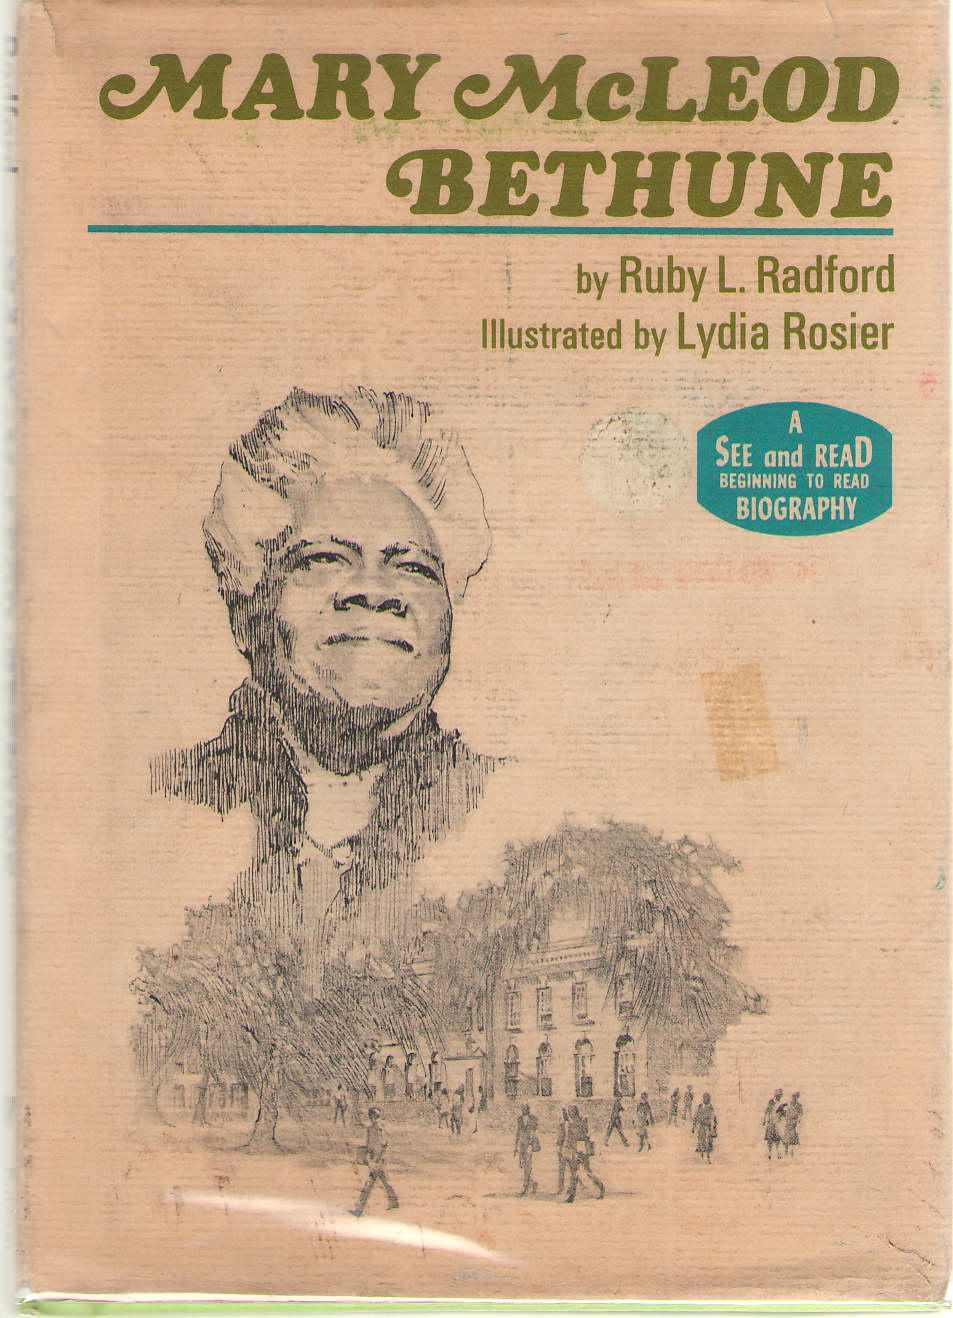 Mary McLeod Bethune, Radford, Ruby Lorraine & Lydia Rosier (Illustrator)